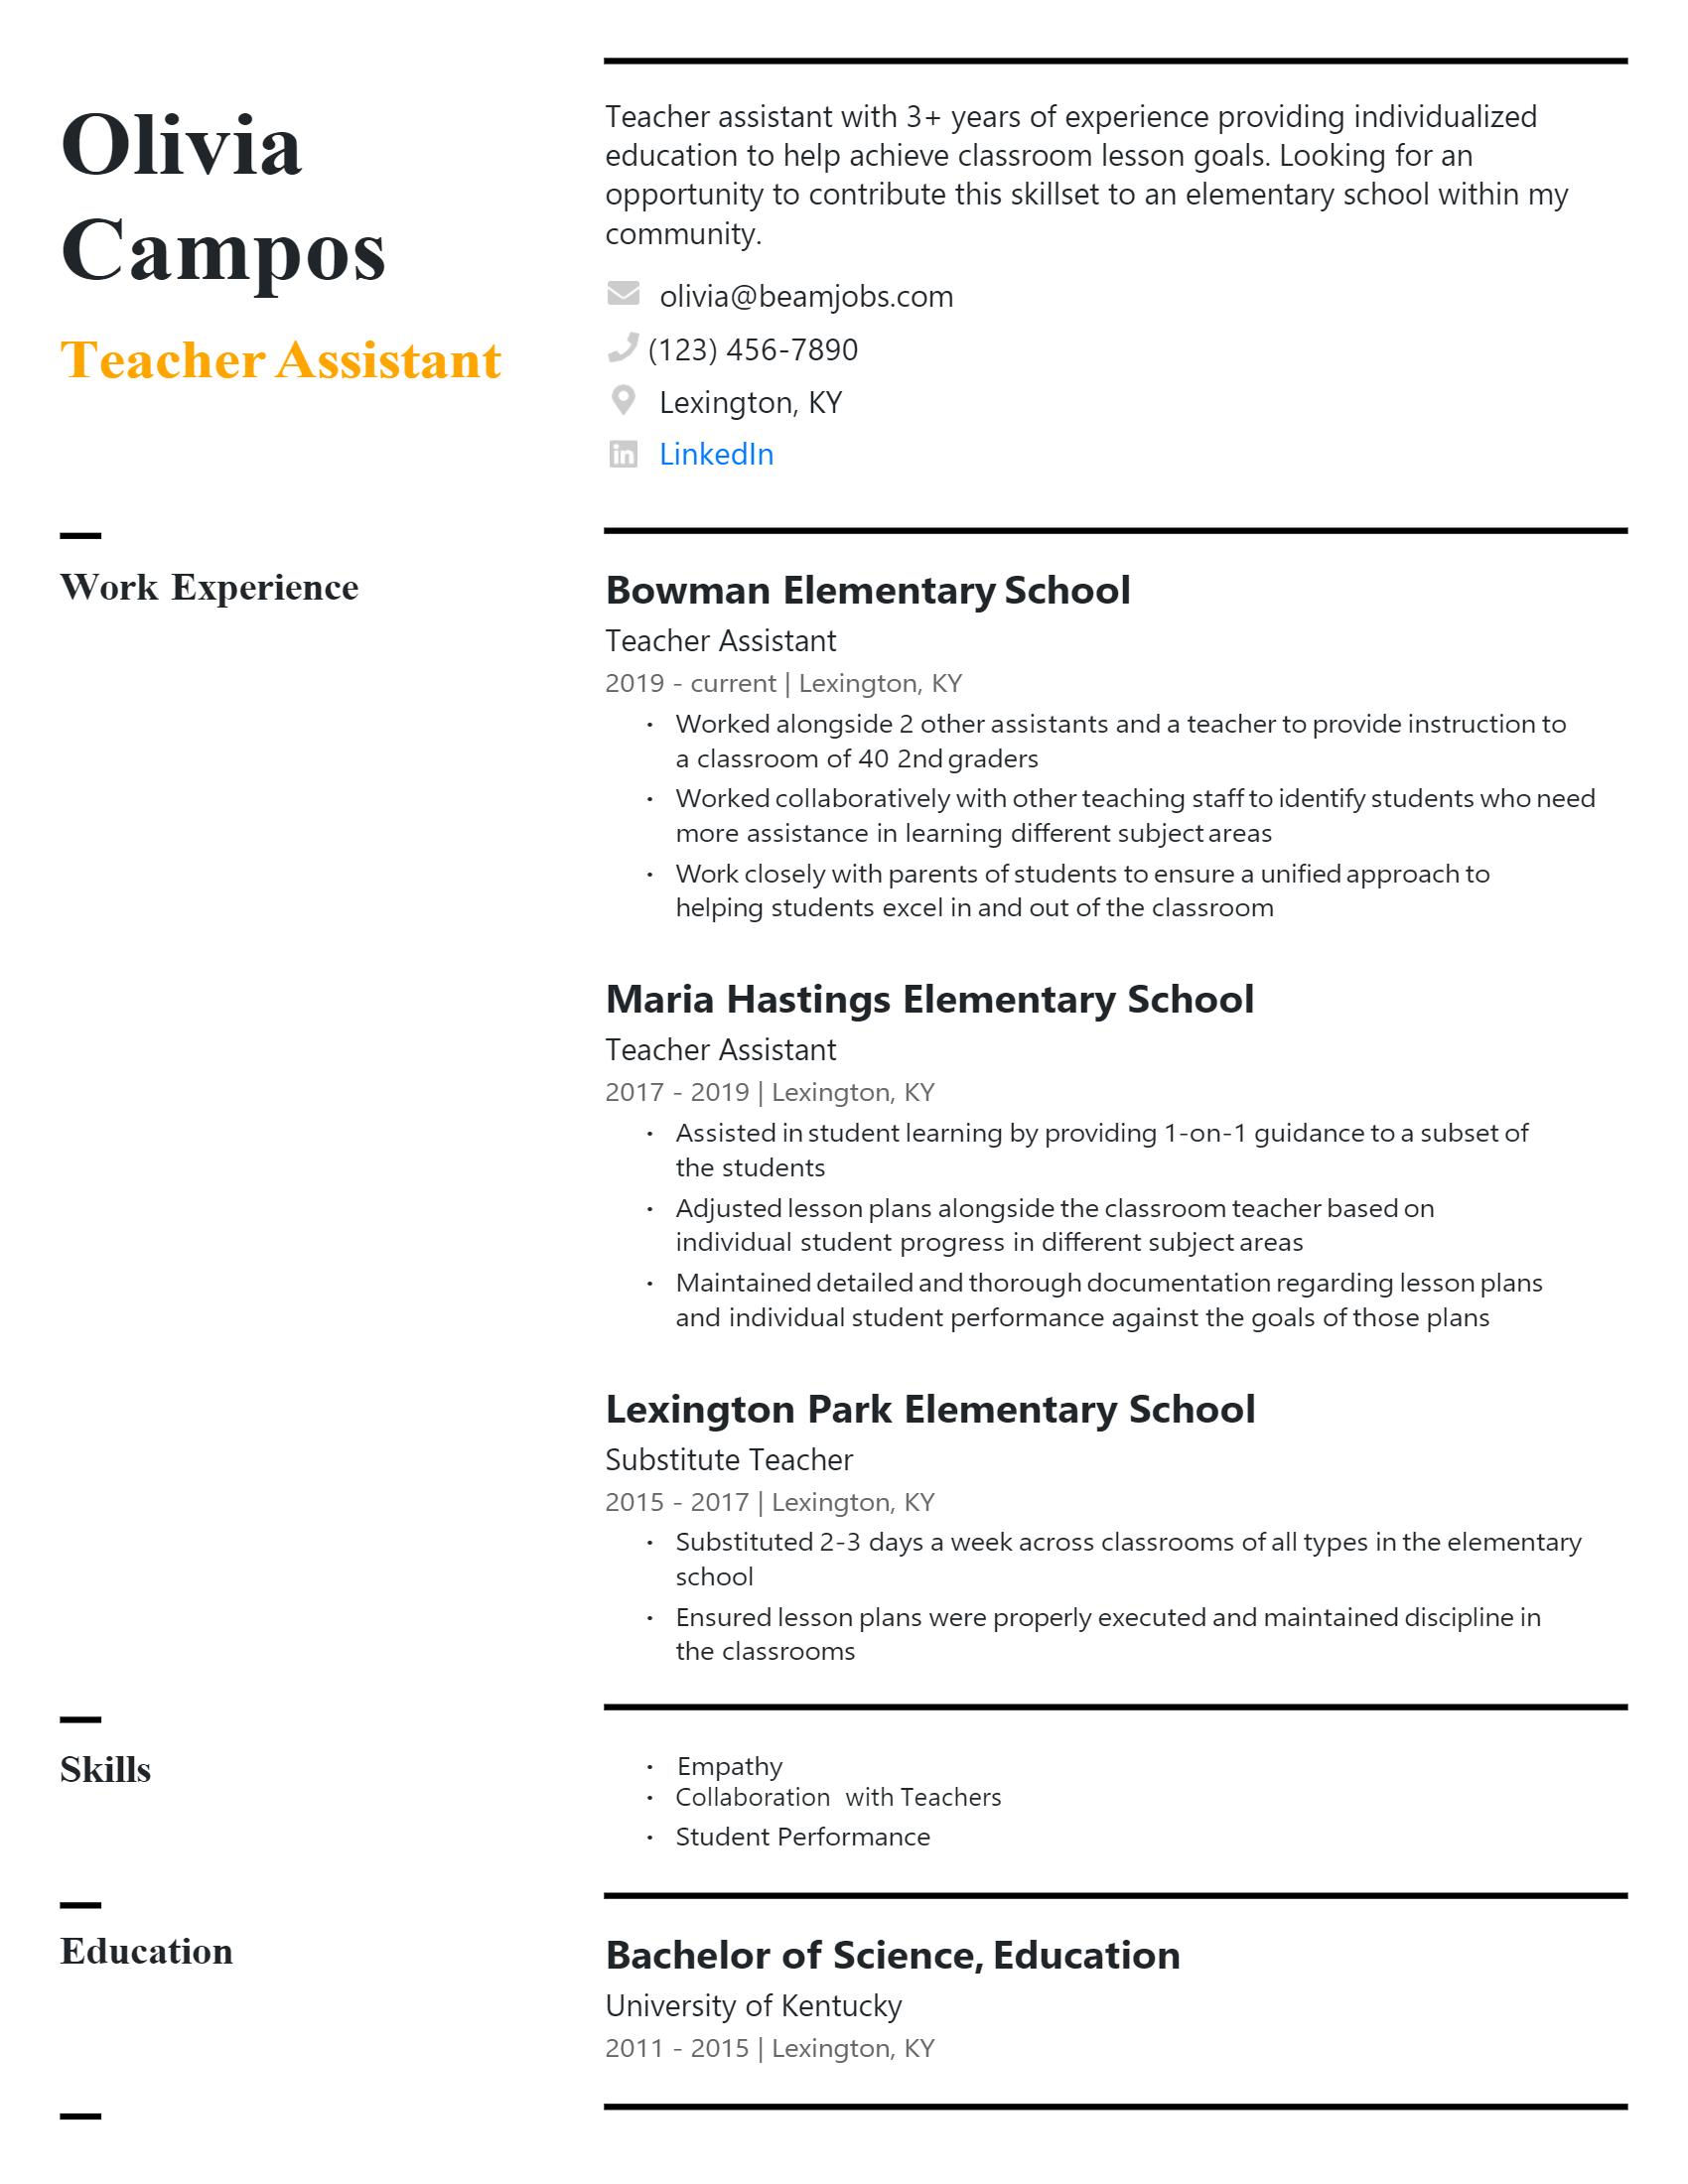 Teacher Assistant Resume .Docx (Word)